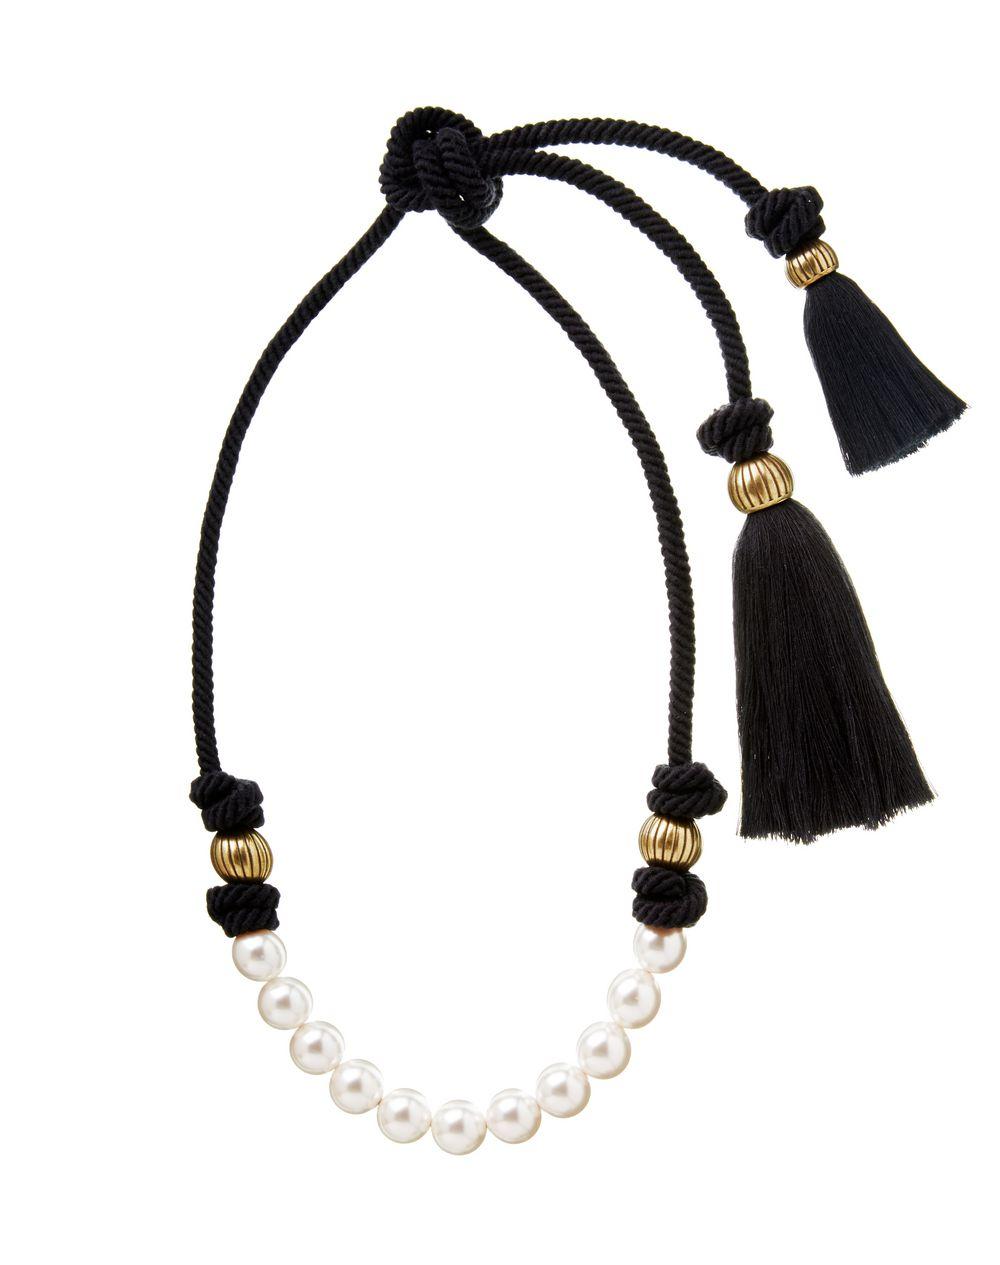 Chiara short necklace - Lanvin